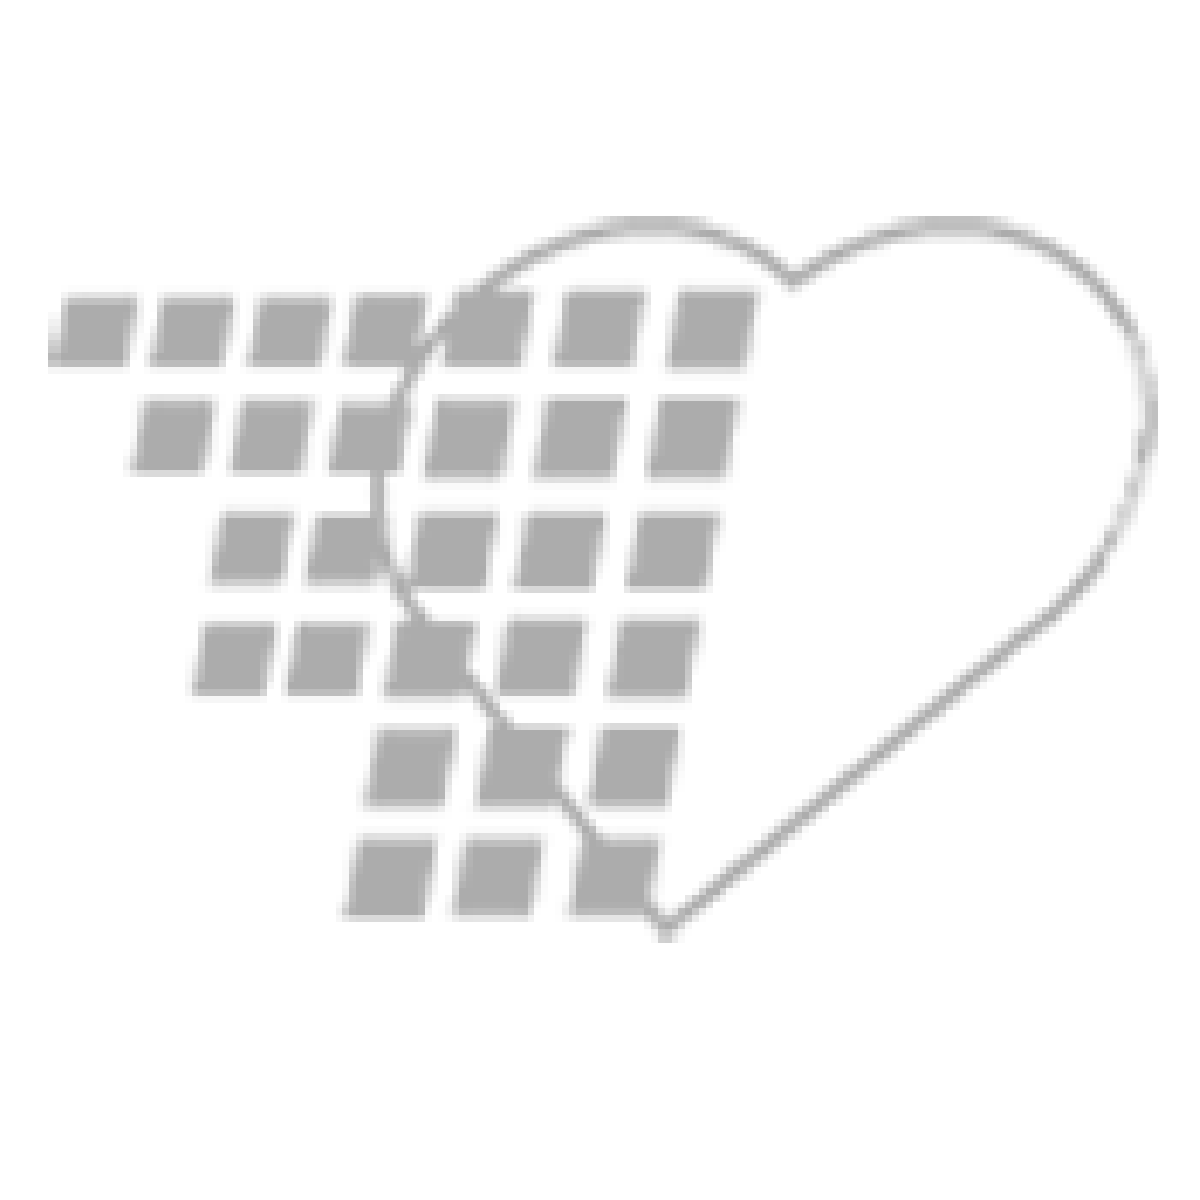 06-93-1131 Demo Dose® Lidocain 2% 5mL